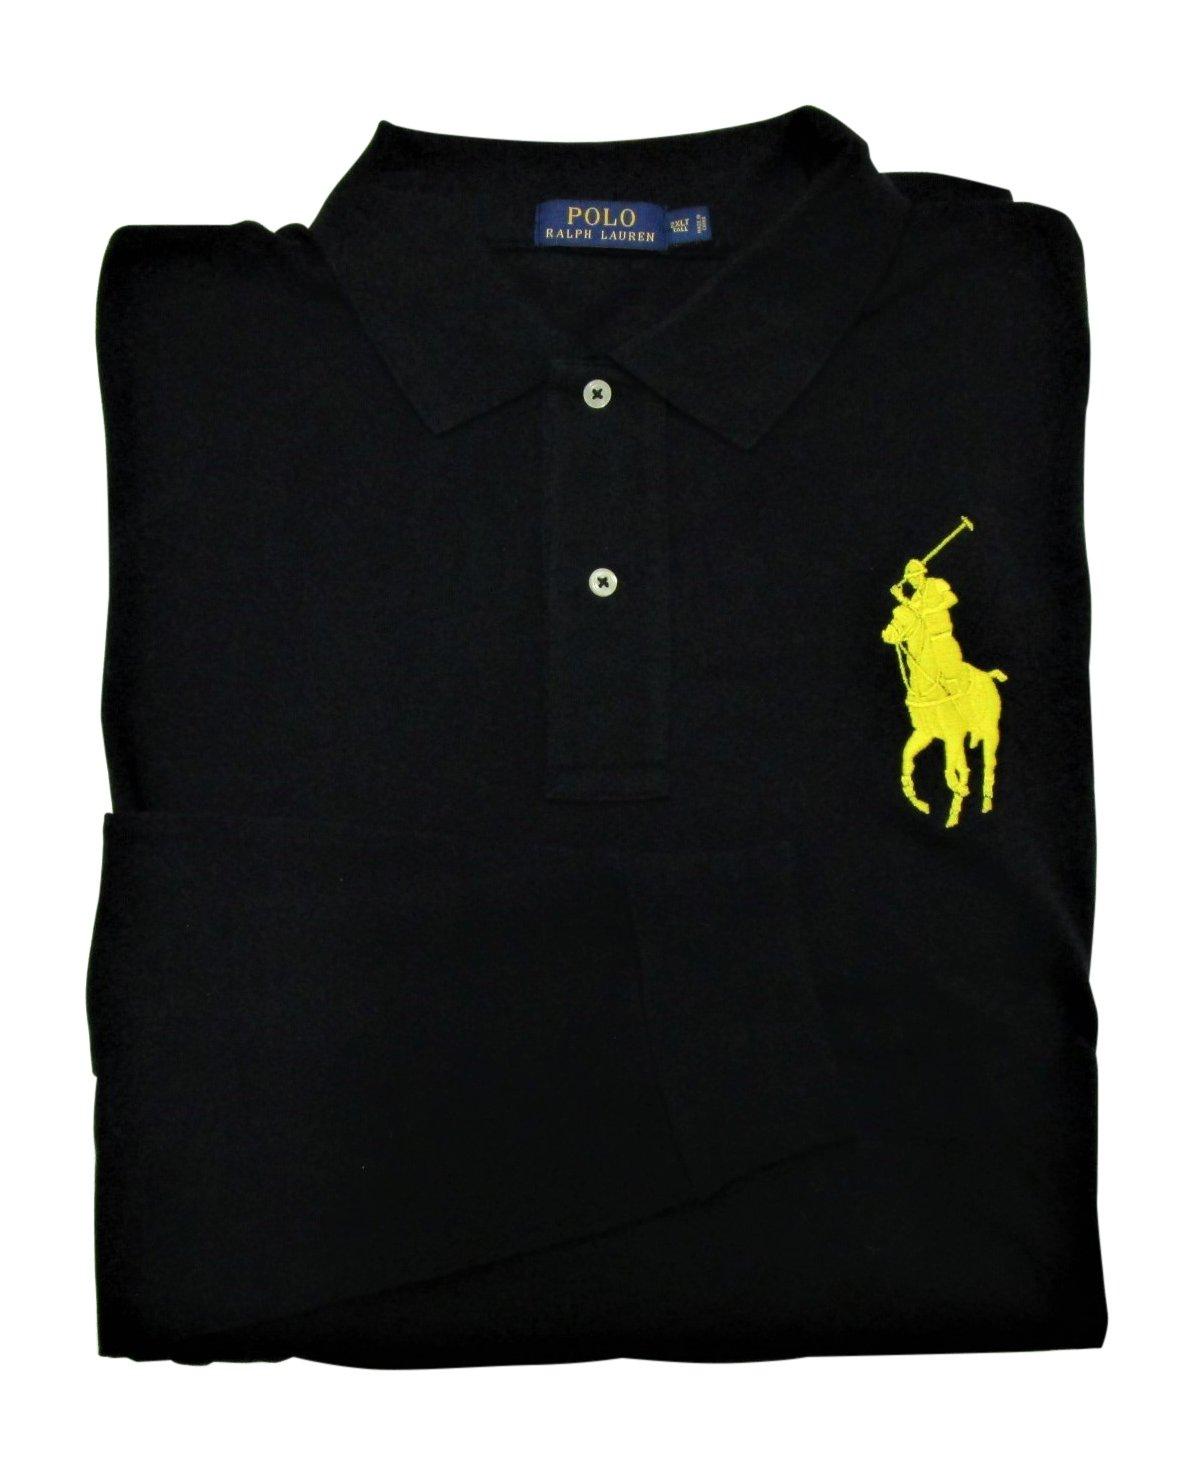 Polo Ralph Lauren Men's Big and Tall Big Pony Cotton Polo Shirt Long Sleeve Pique Mesh (2XLT, Polo Black)